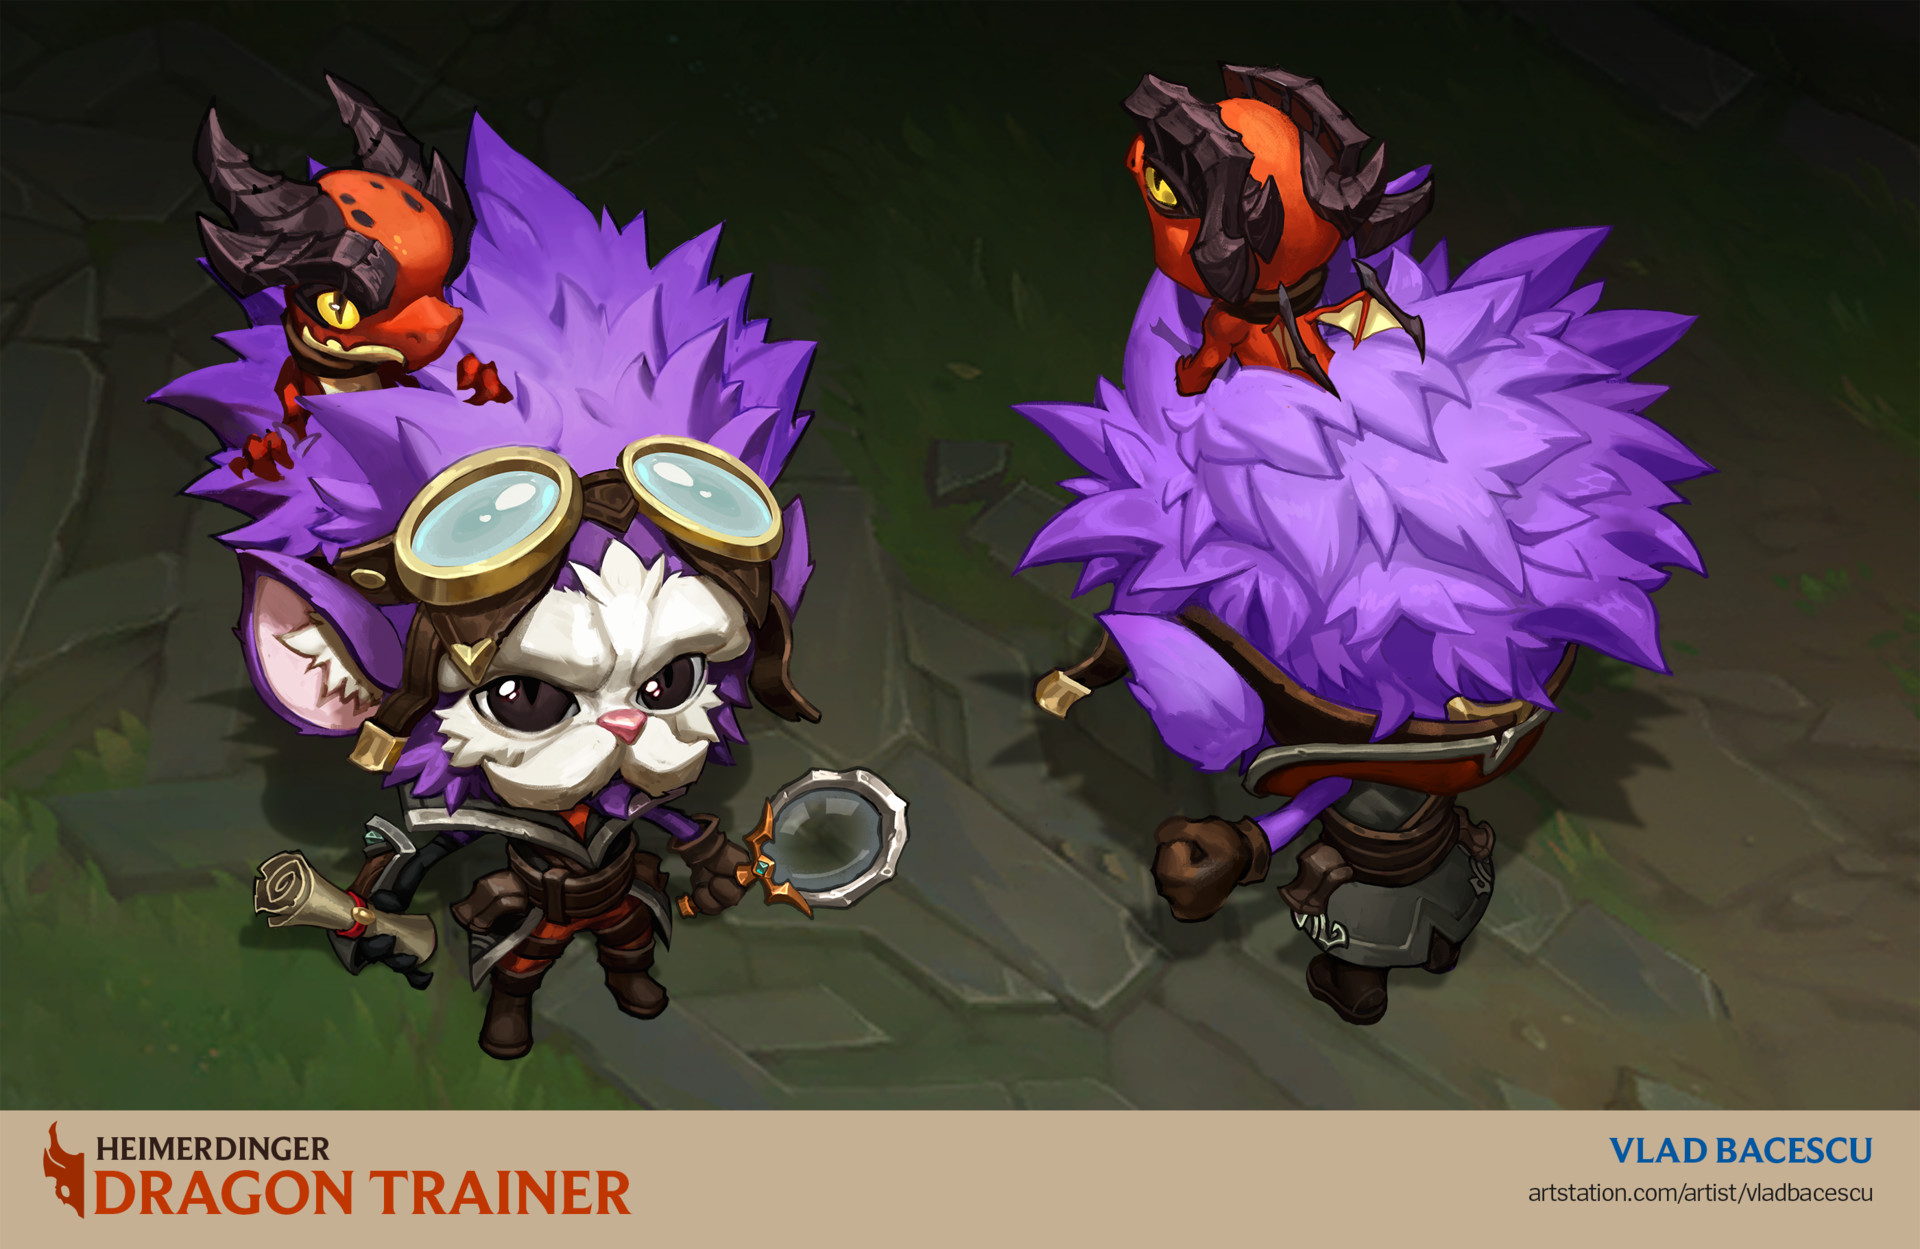 Heimerdinger Treinador de Dragões